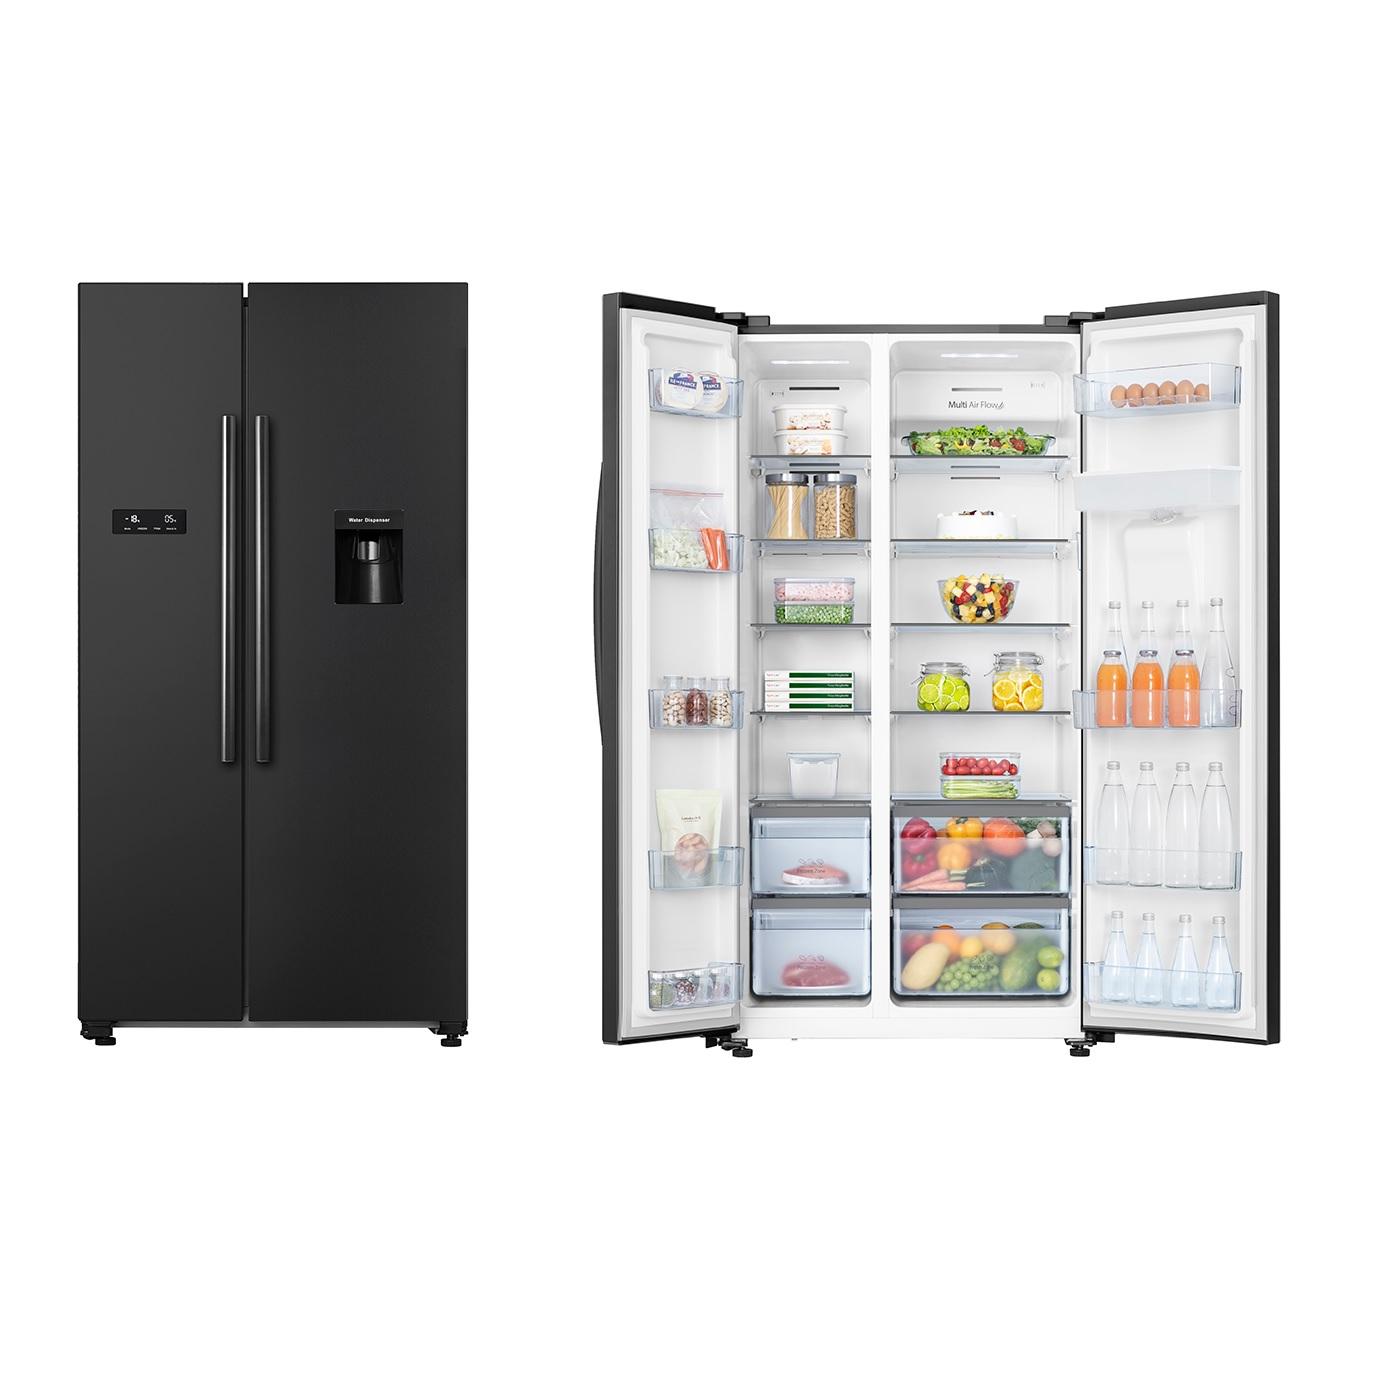 Hisense 624l Black Refrigerator